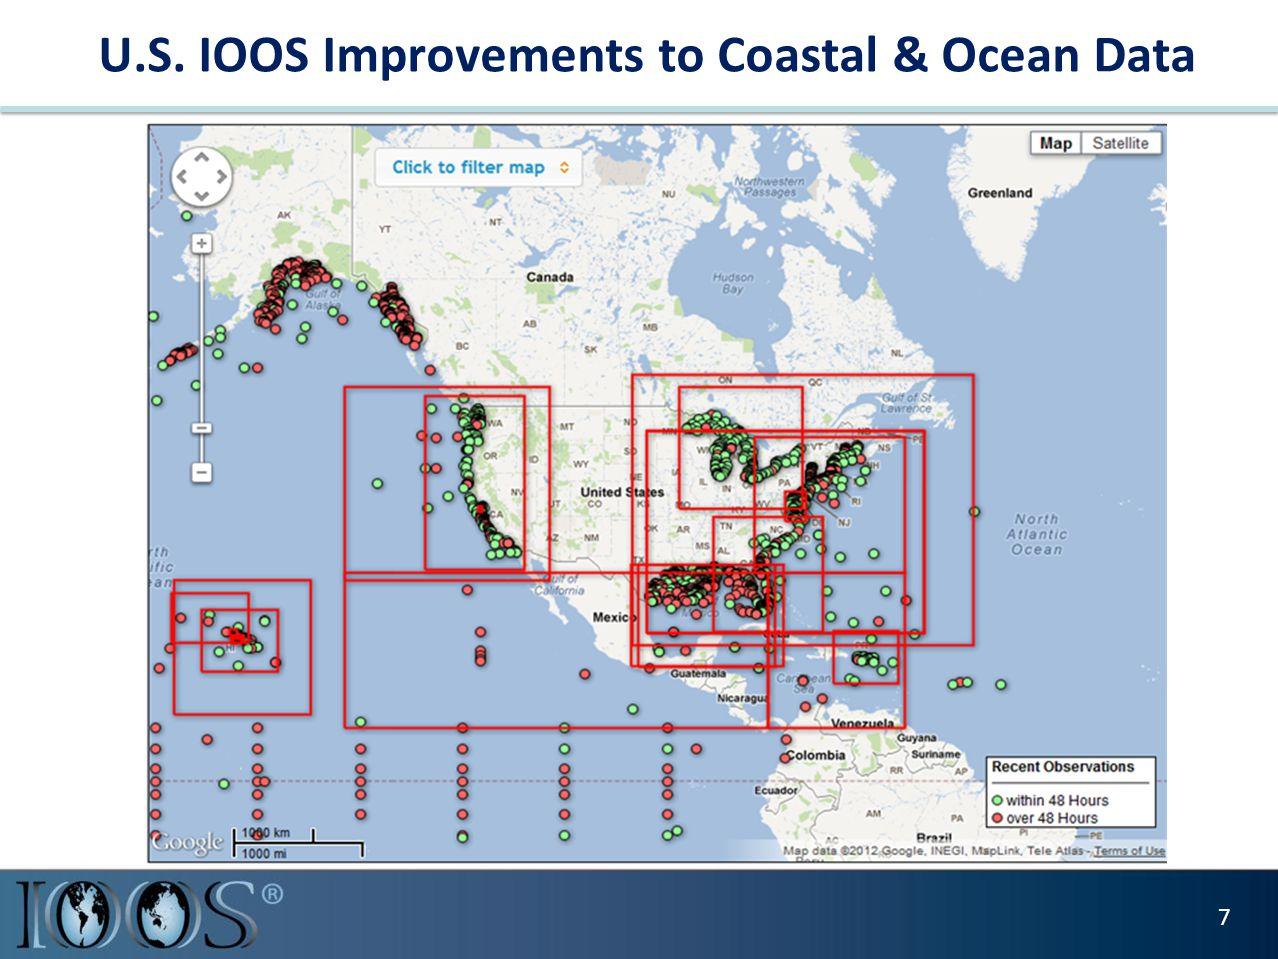 U.S. IOOS Improvements to Coastal & Ocean Data 7